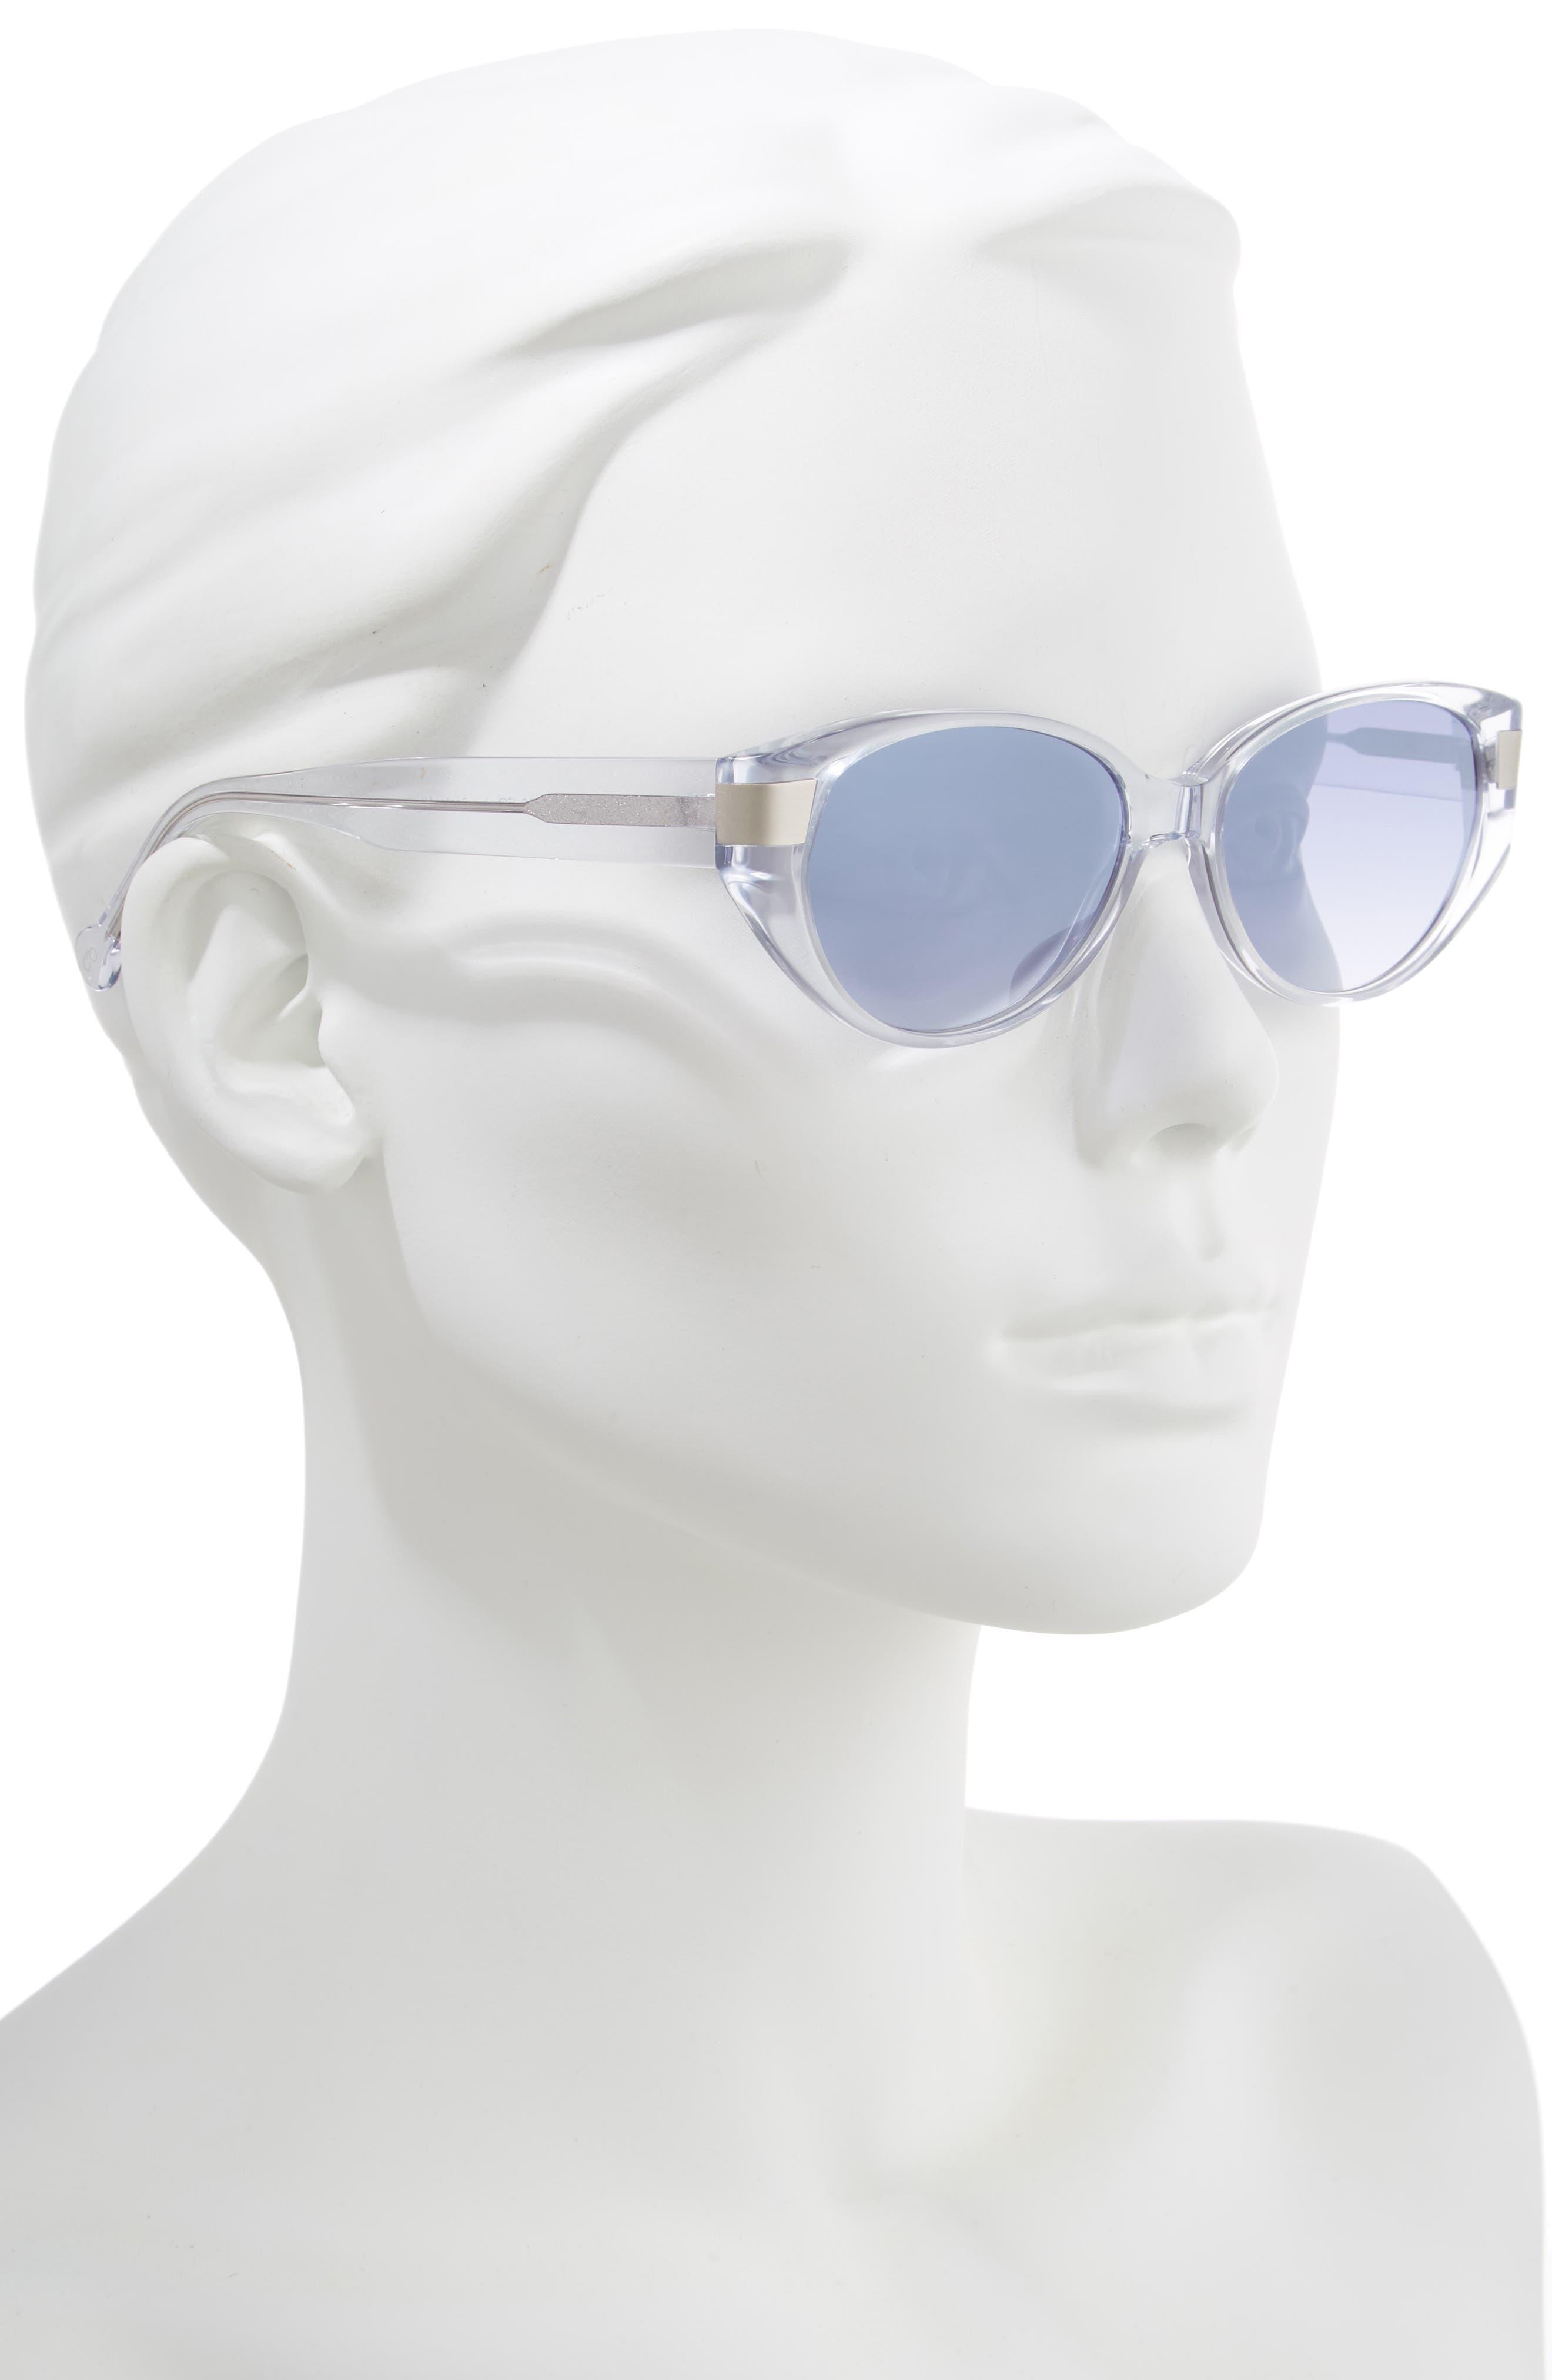 Southbeach 54mm Gradient Cat Eye Sunglasses,                             Alternate thumbnail 2, color,                             CRYSTAL